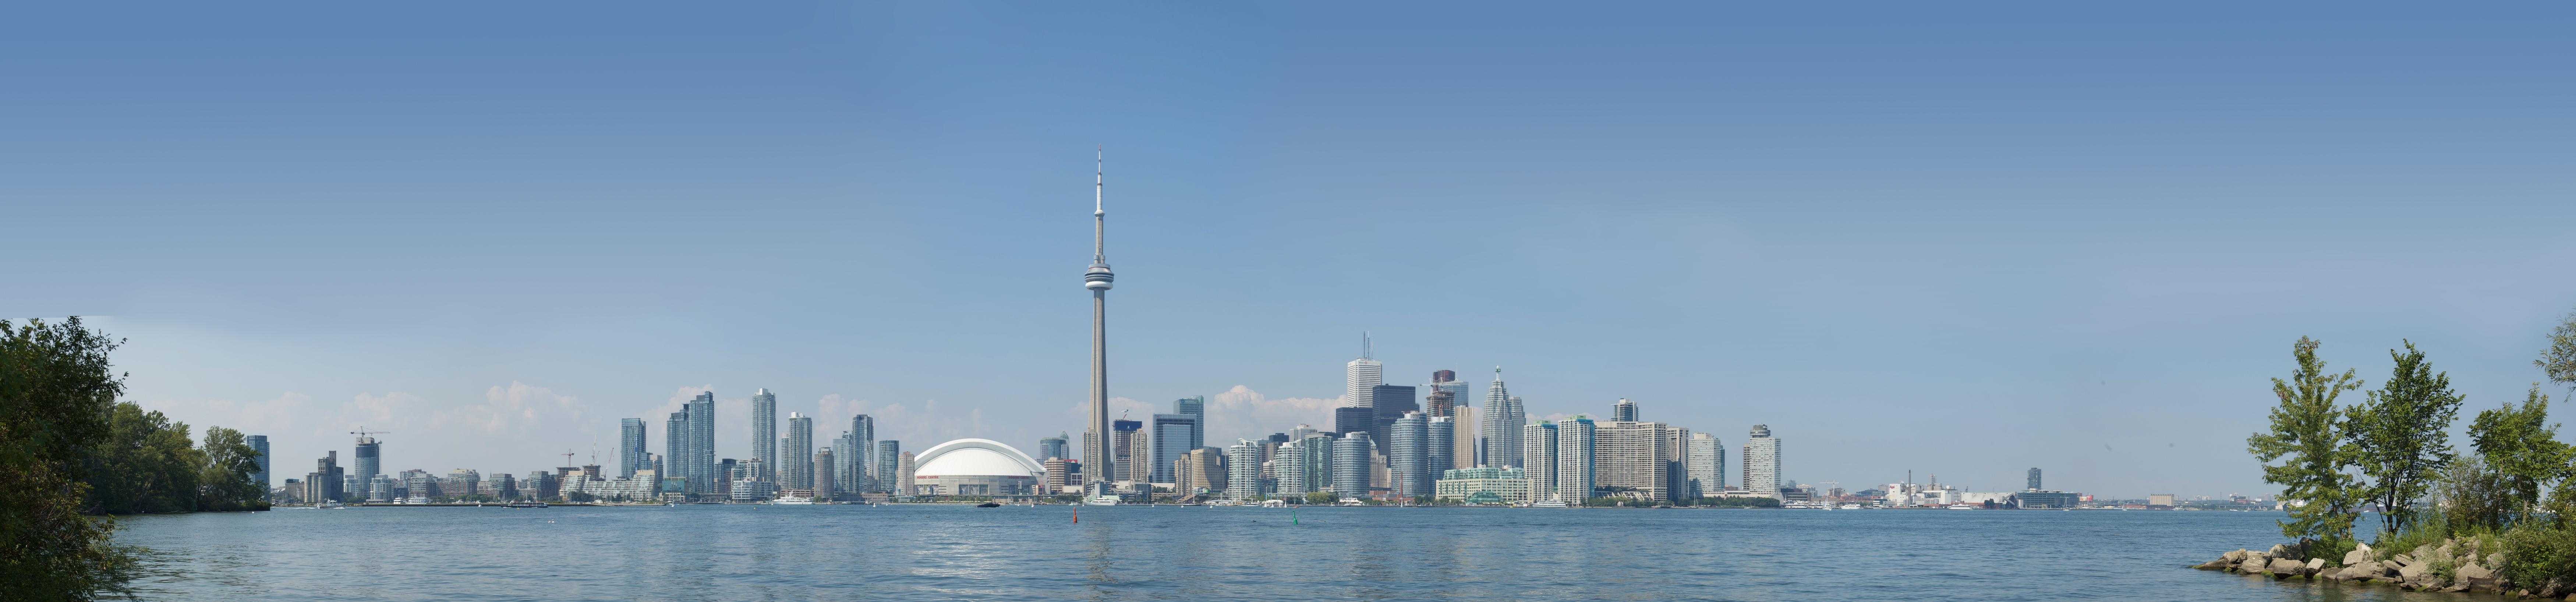 Size Of Toronto Island